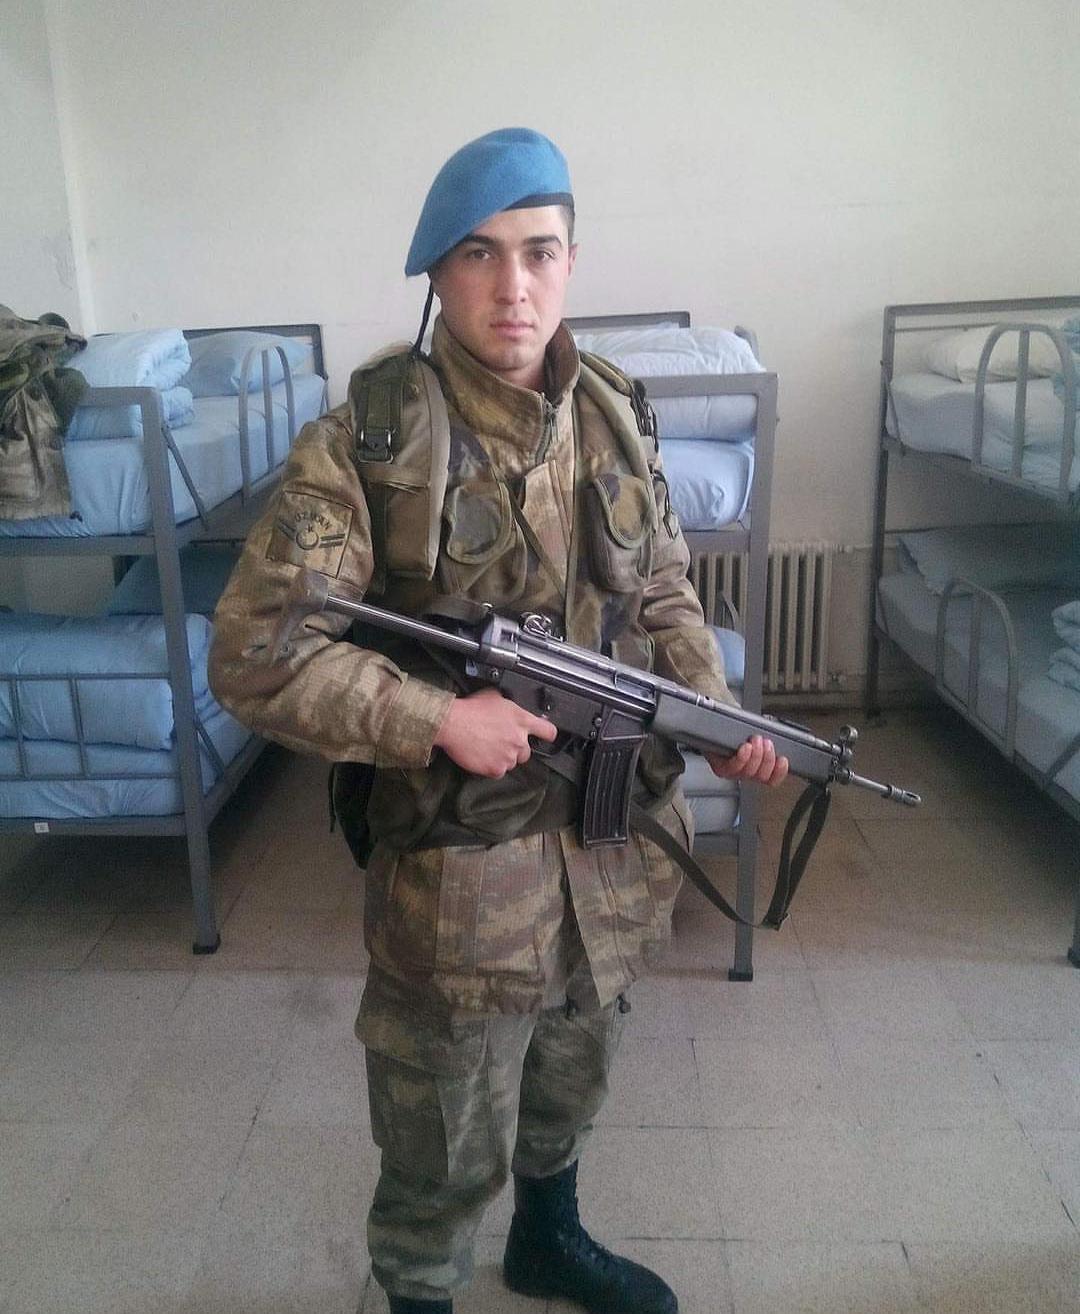 View şehit's Full Profile